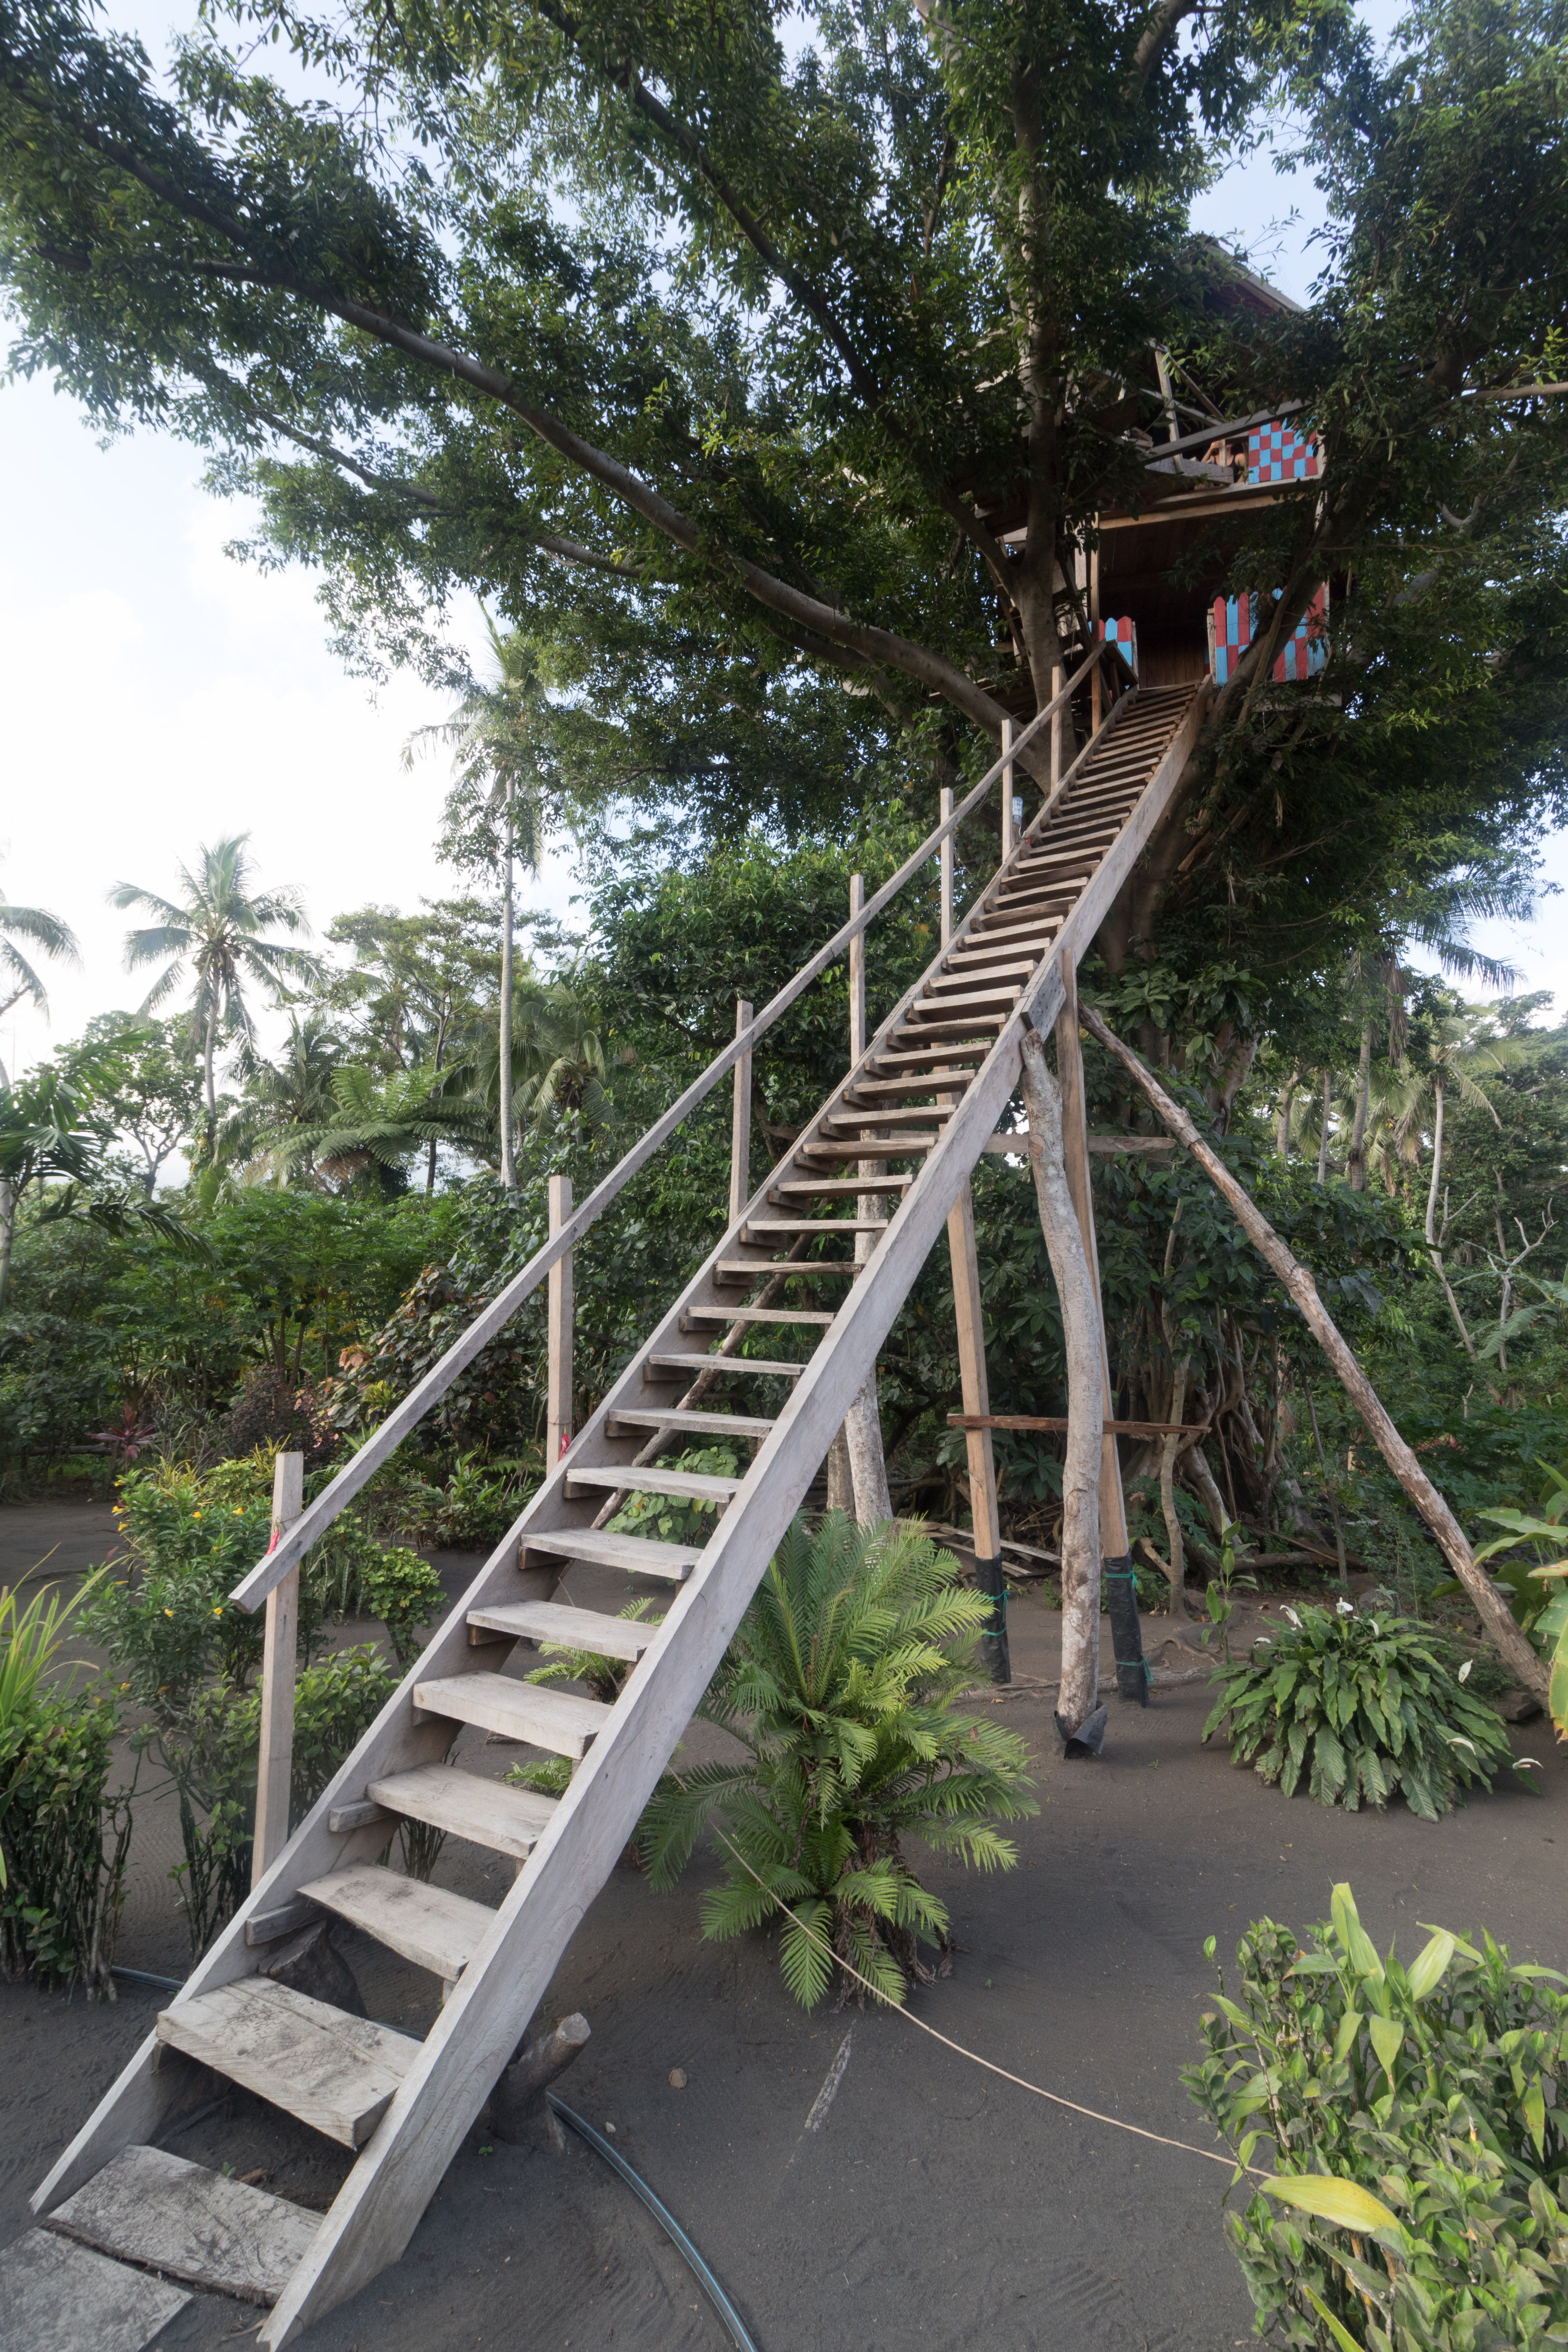 Yvonderweg - Avontuurlijk Tanna - Boomhut Yasur View Lodge